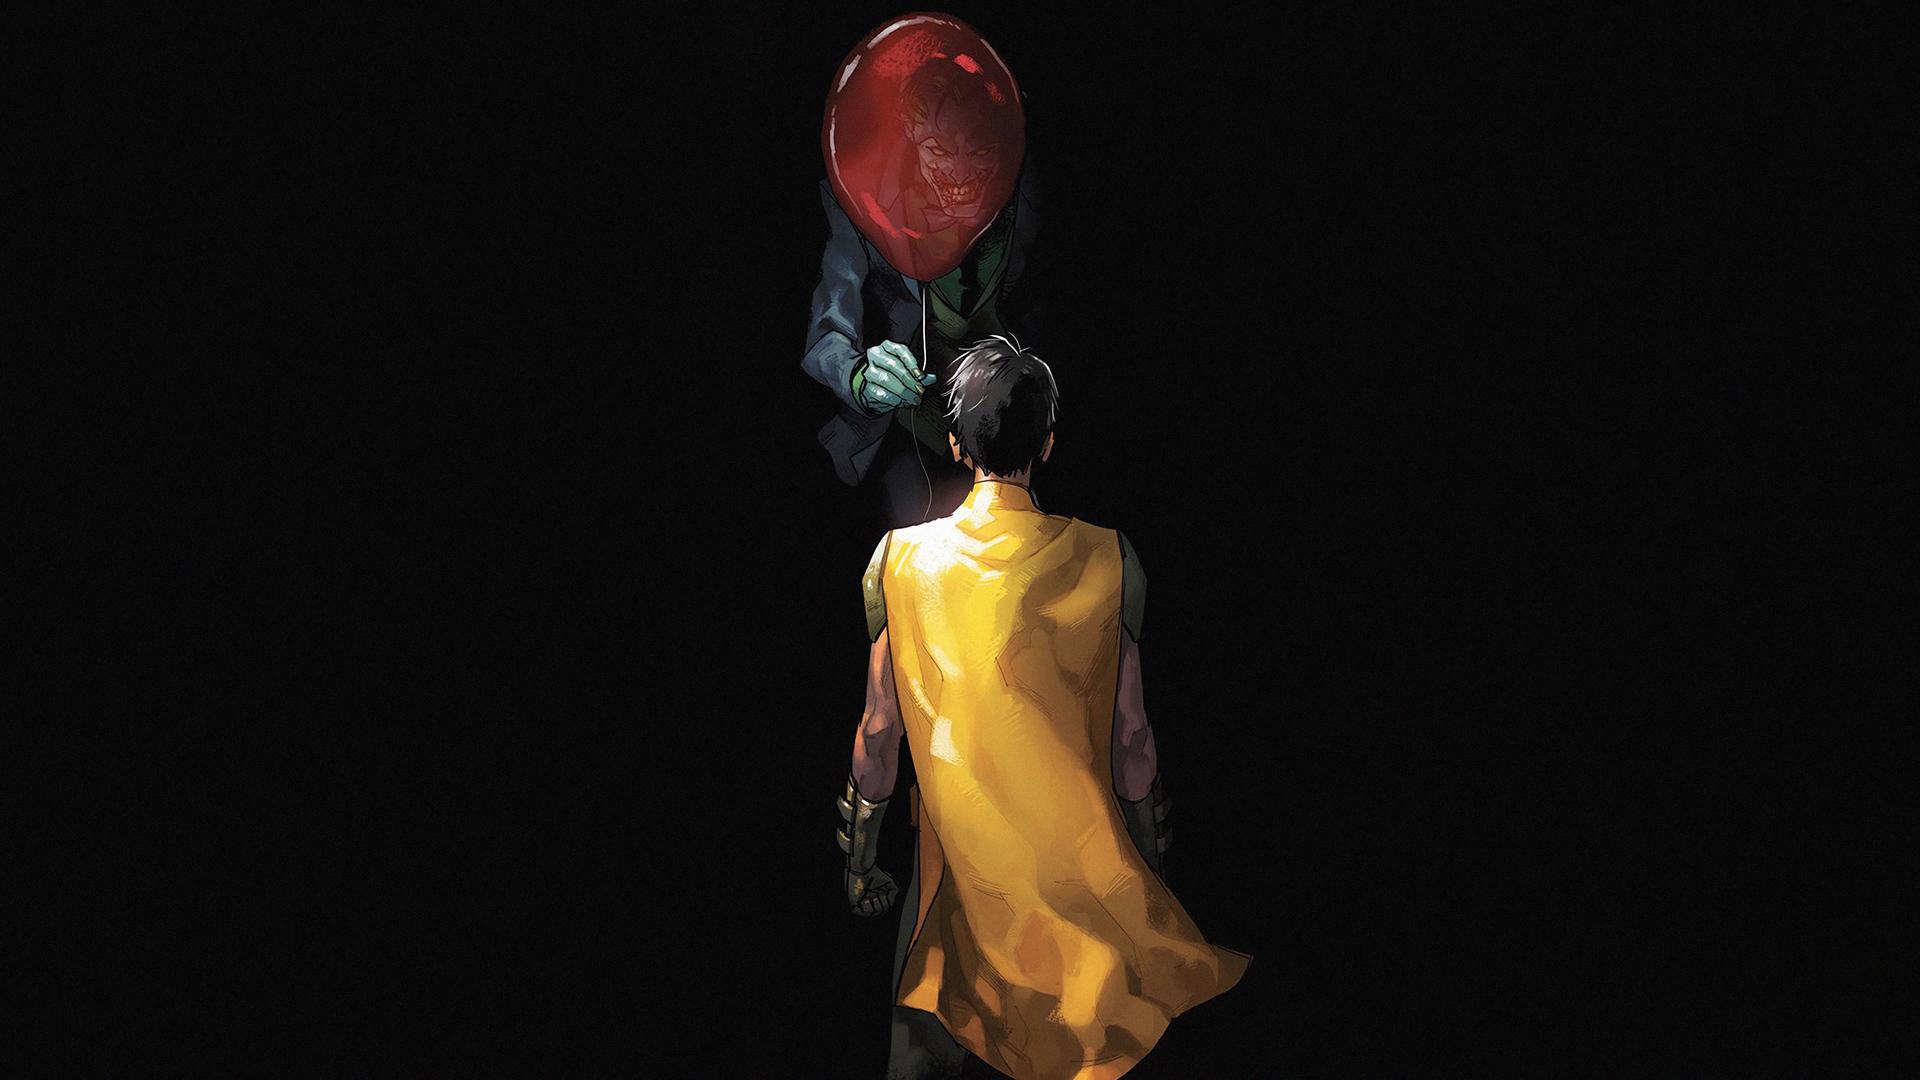 joker-giving-balloon-to-robin-u9.jpg